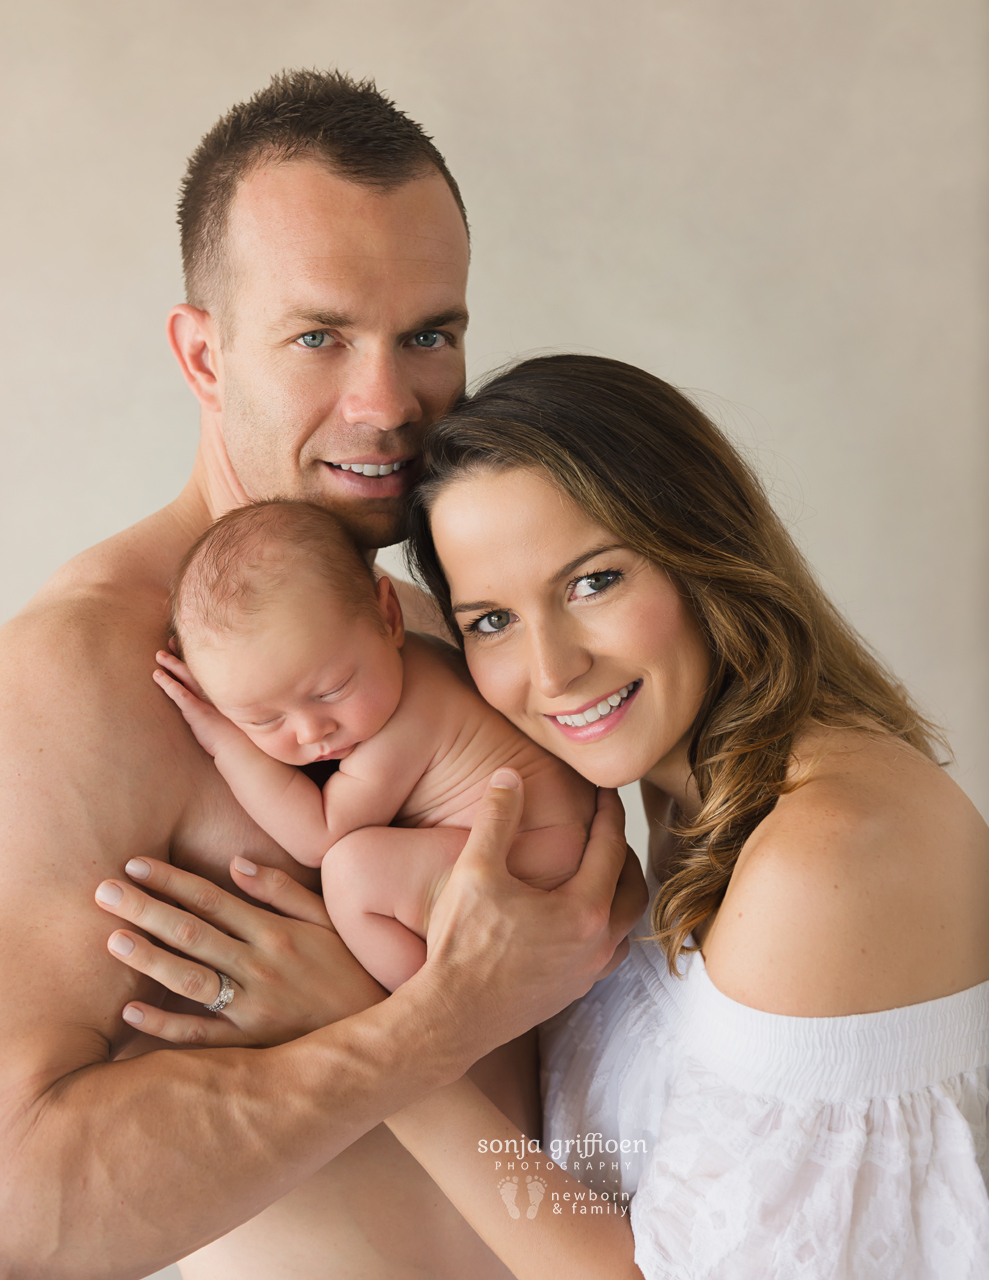 Bobby-Newborn-Brisbane-Newborn-Photographer-Sonja-Griffioen-12.jpg